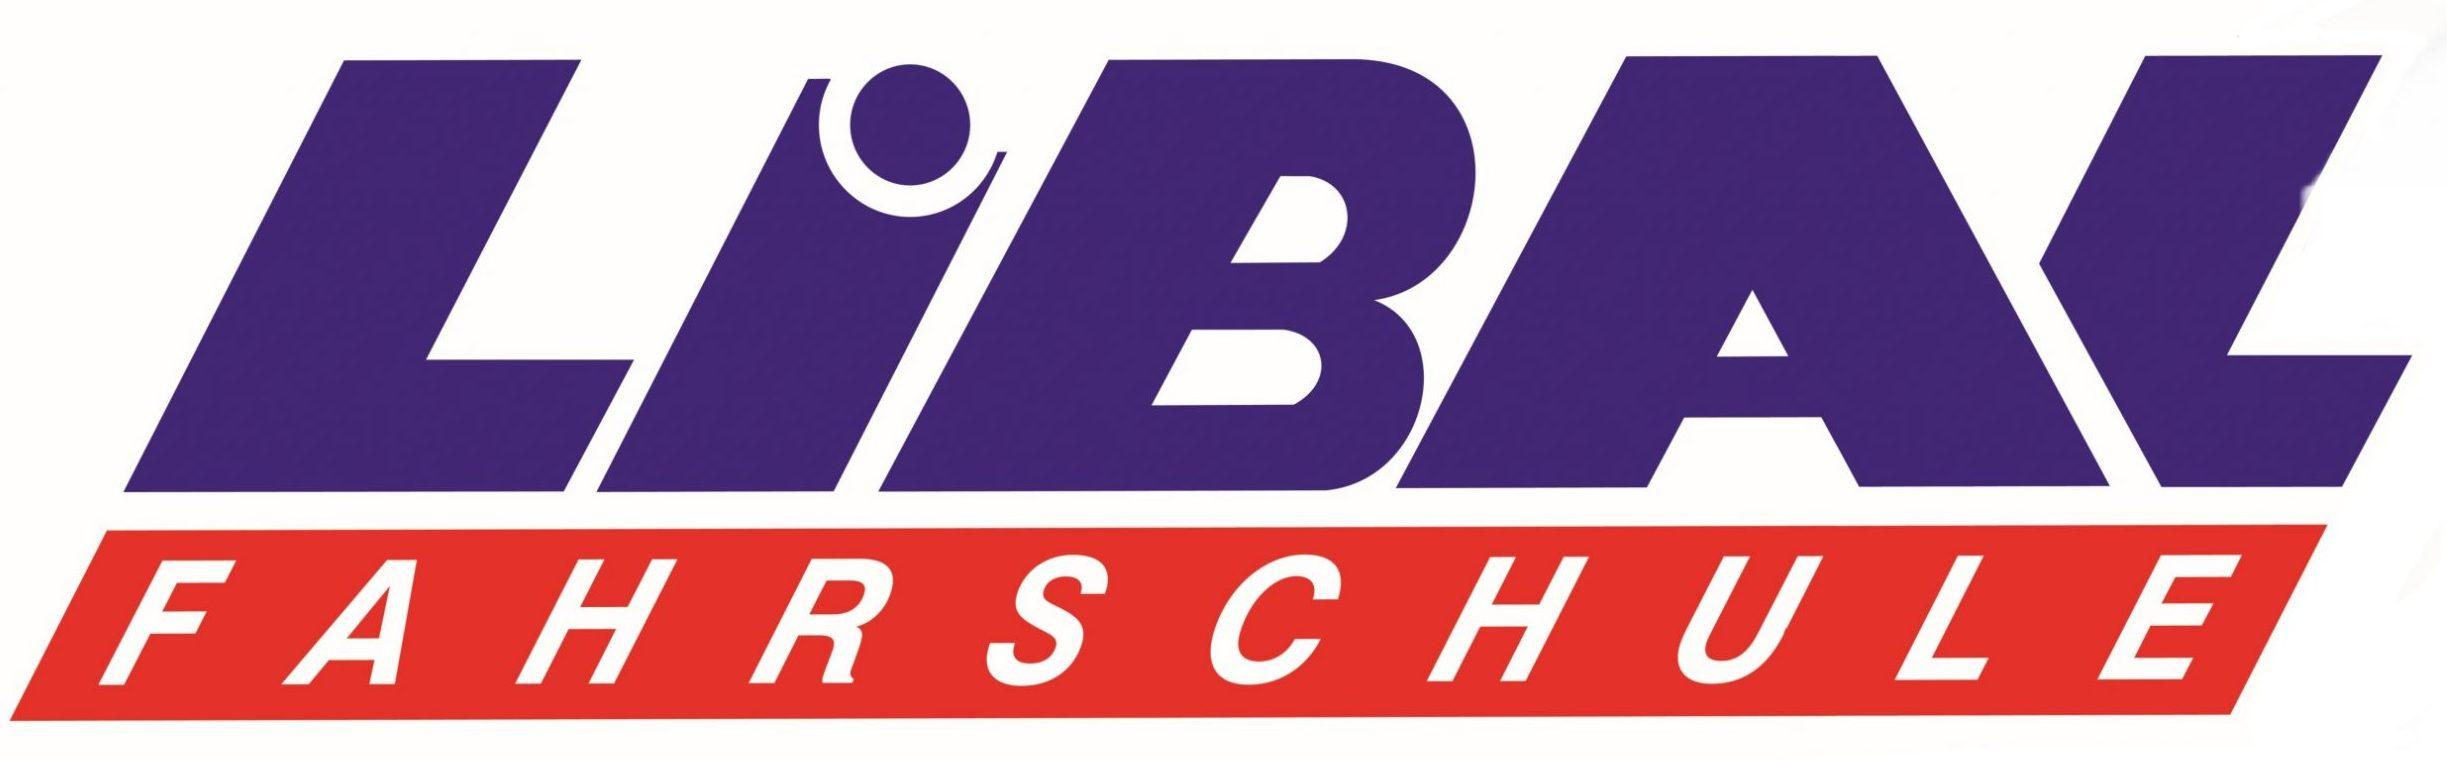 Fahrschule Libal